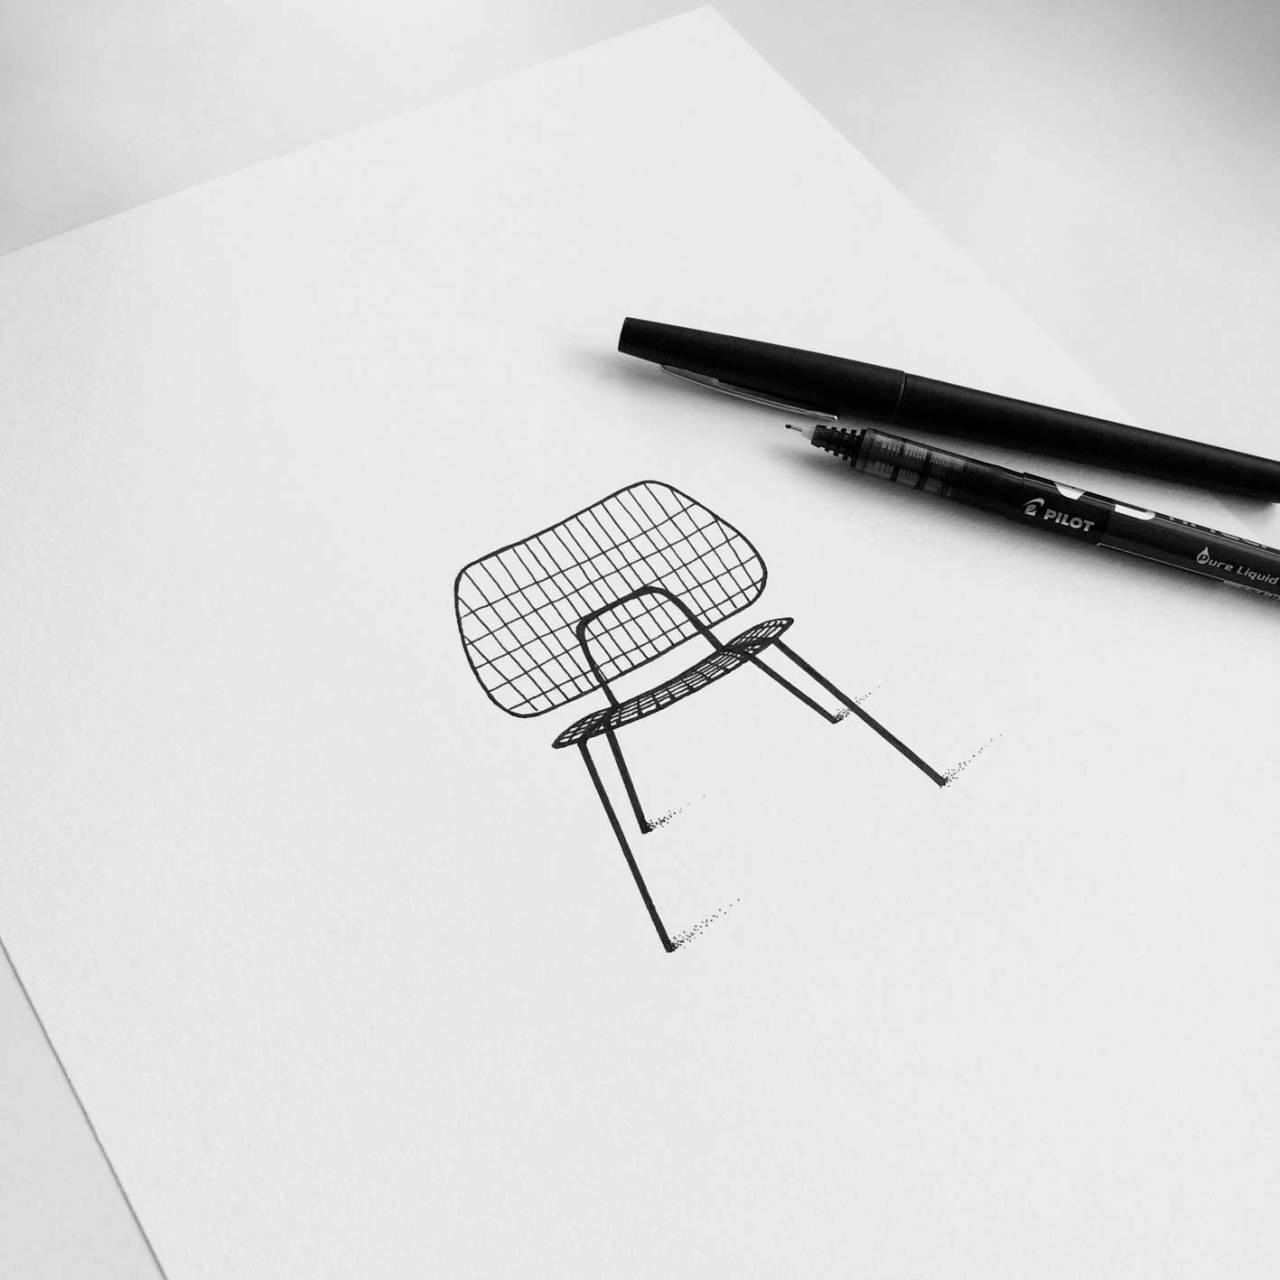 design_swennjed_rotring_04